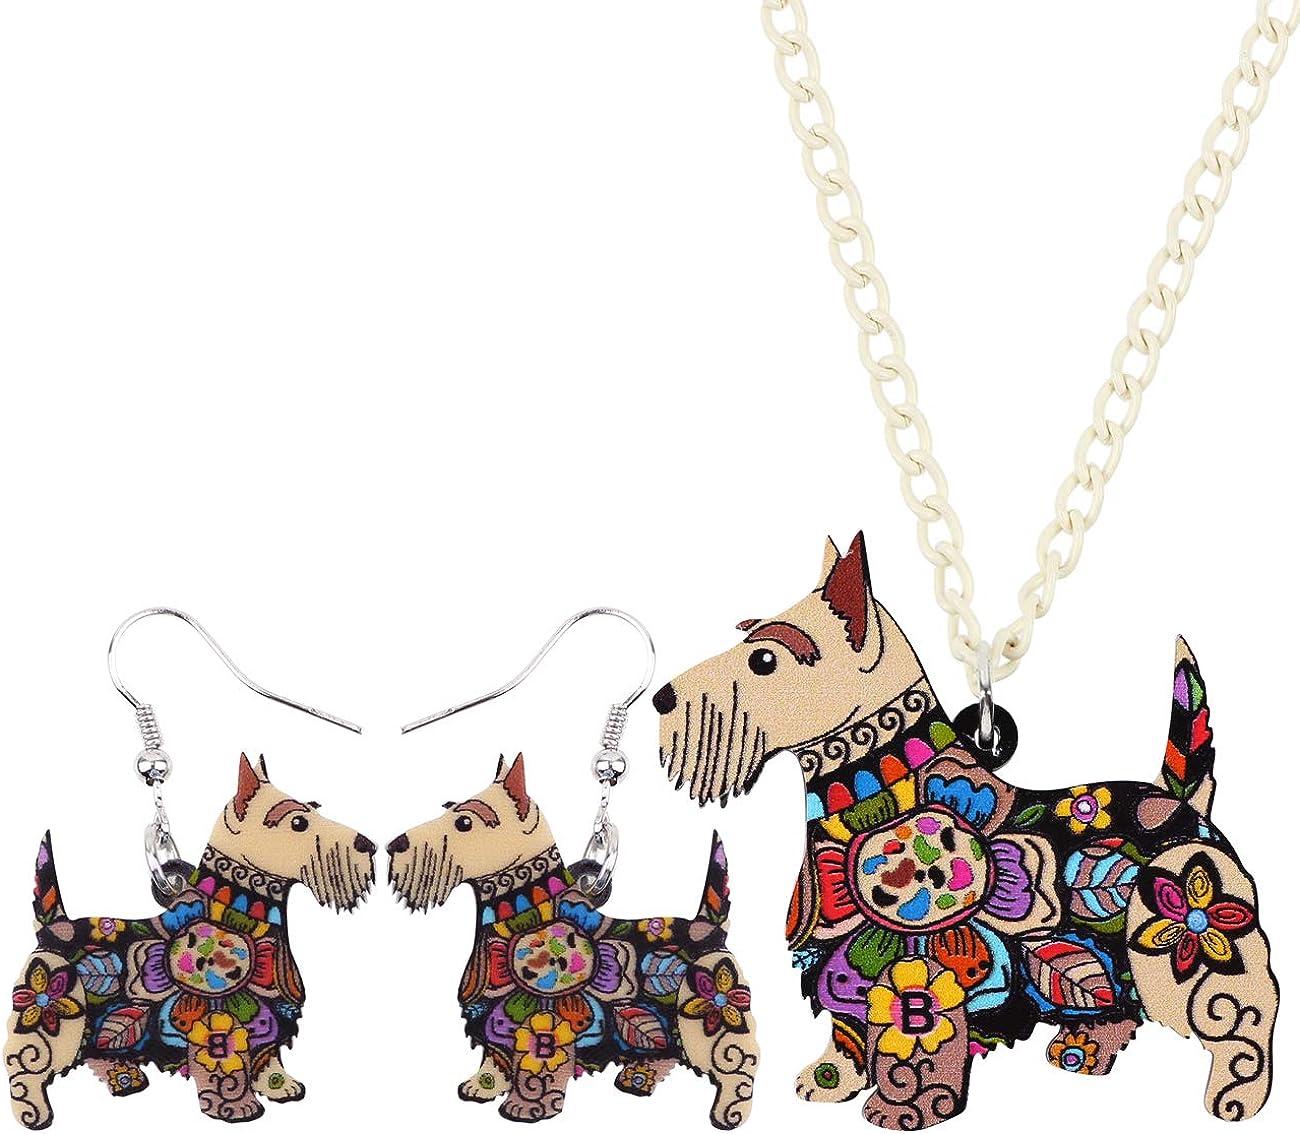 DUOWEI Acrylic Cute Aberdeen Scottish Terrier Dog Earrings Necklace Jewelry Sets Charms Pets Pendants for Women Teens Girls Kids Gifts